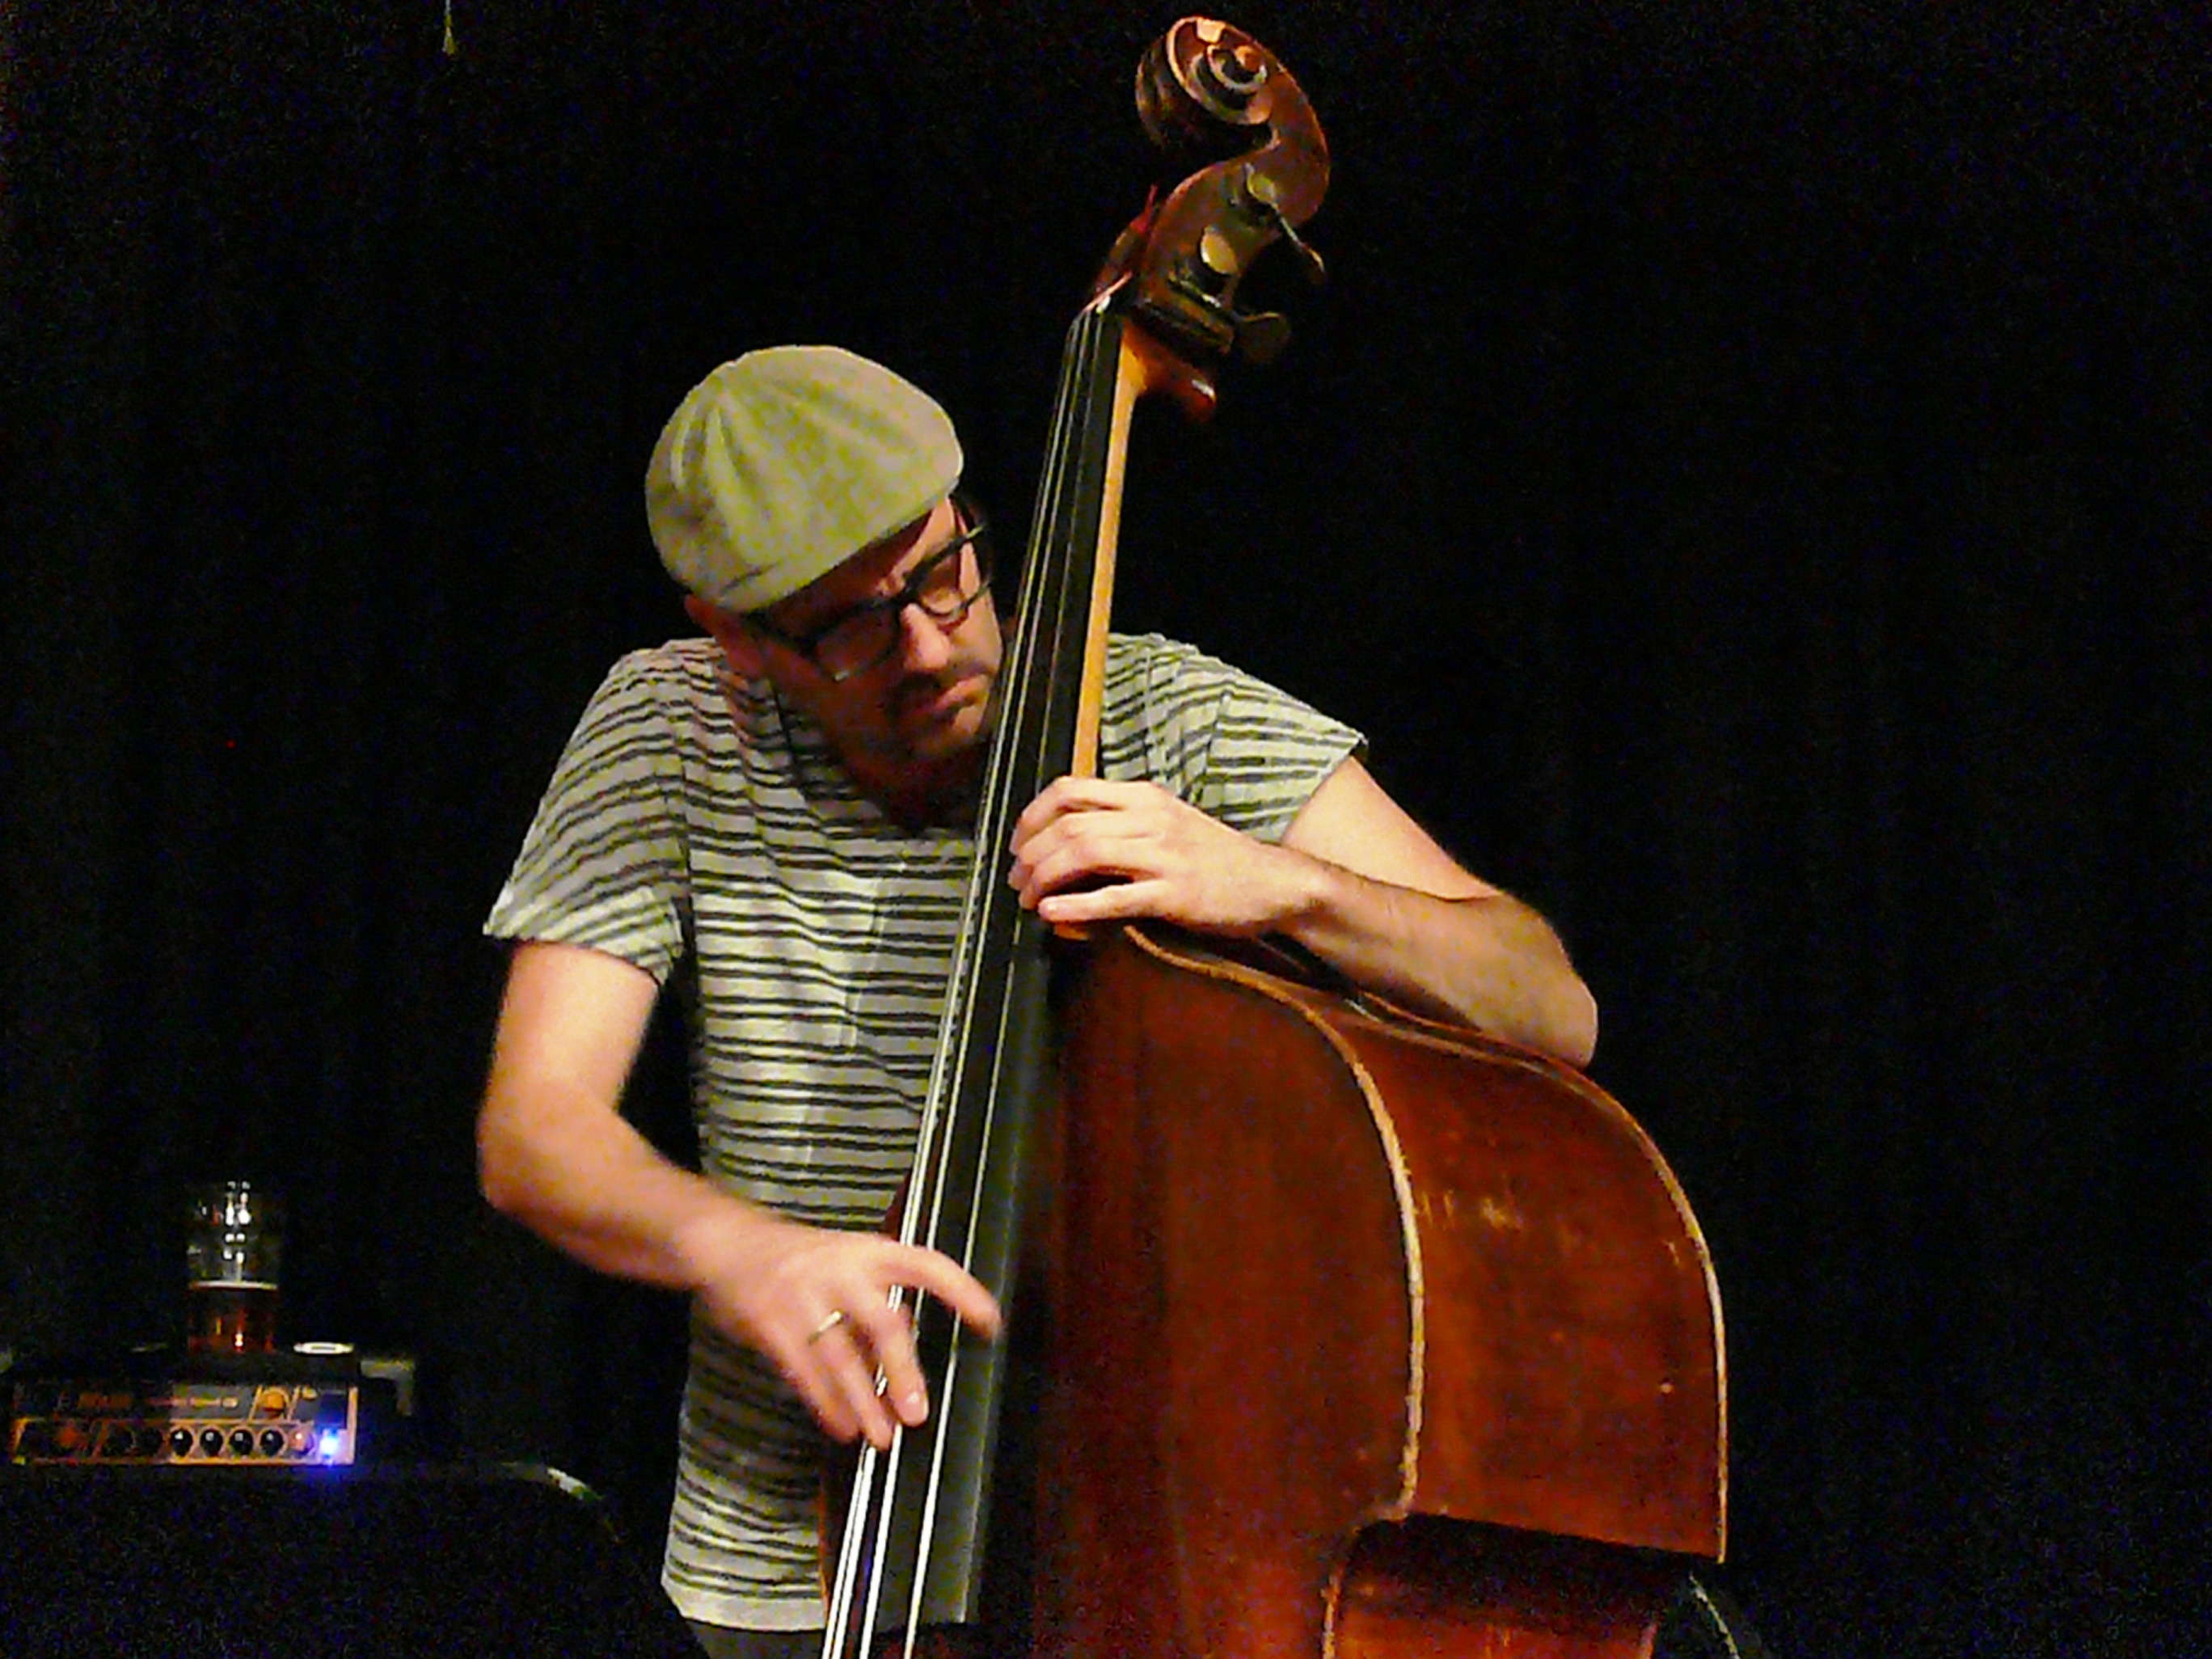 John hebert at the vortex, london in october 2013